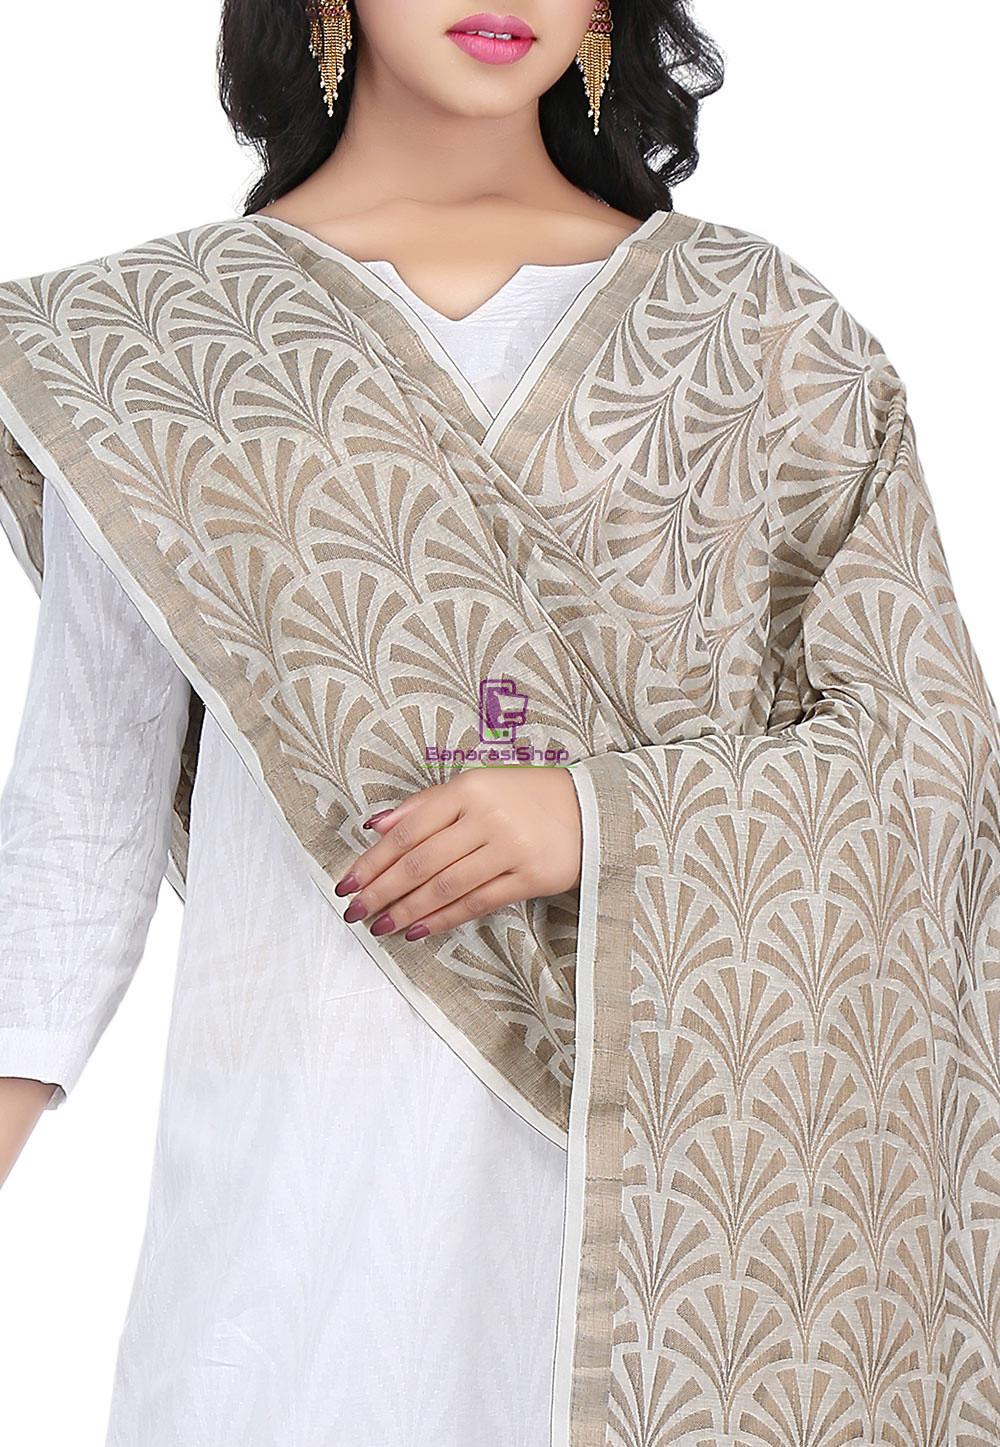 Woven Banarasi Cotton Silk Jacquard Dupatta in Off White 2